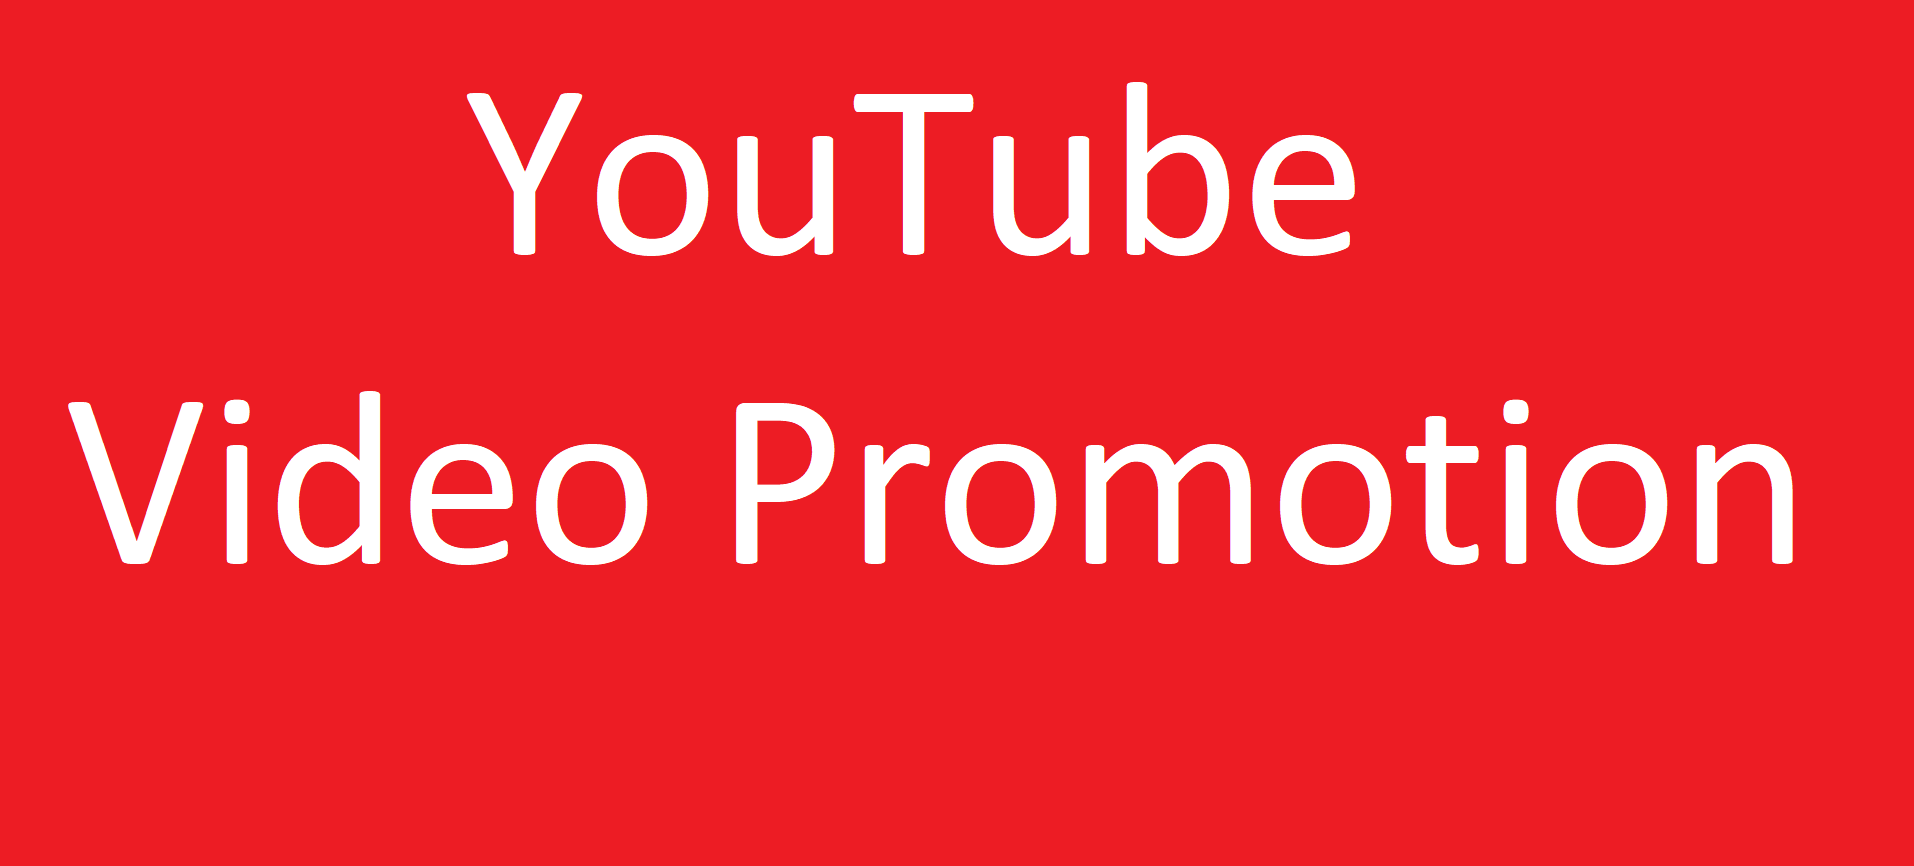 Do Fast Organic Youtube Promotion